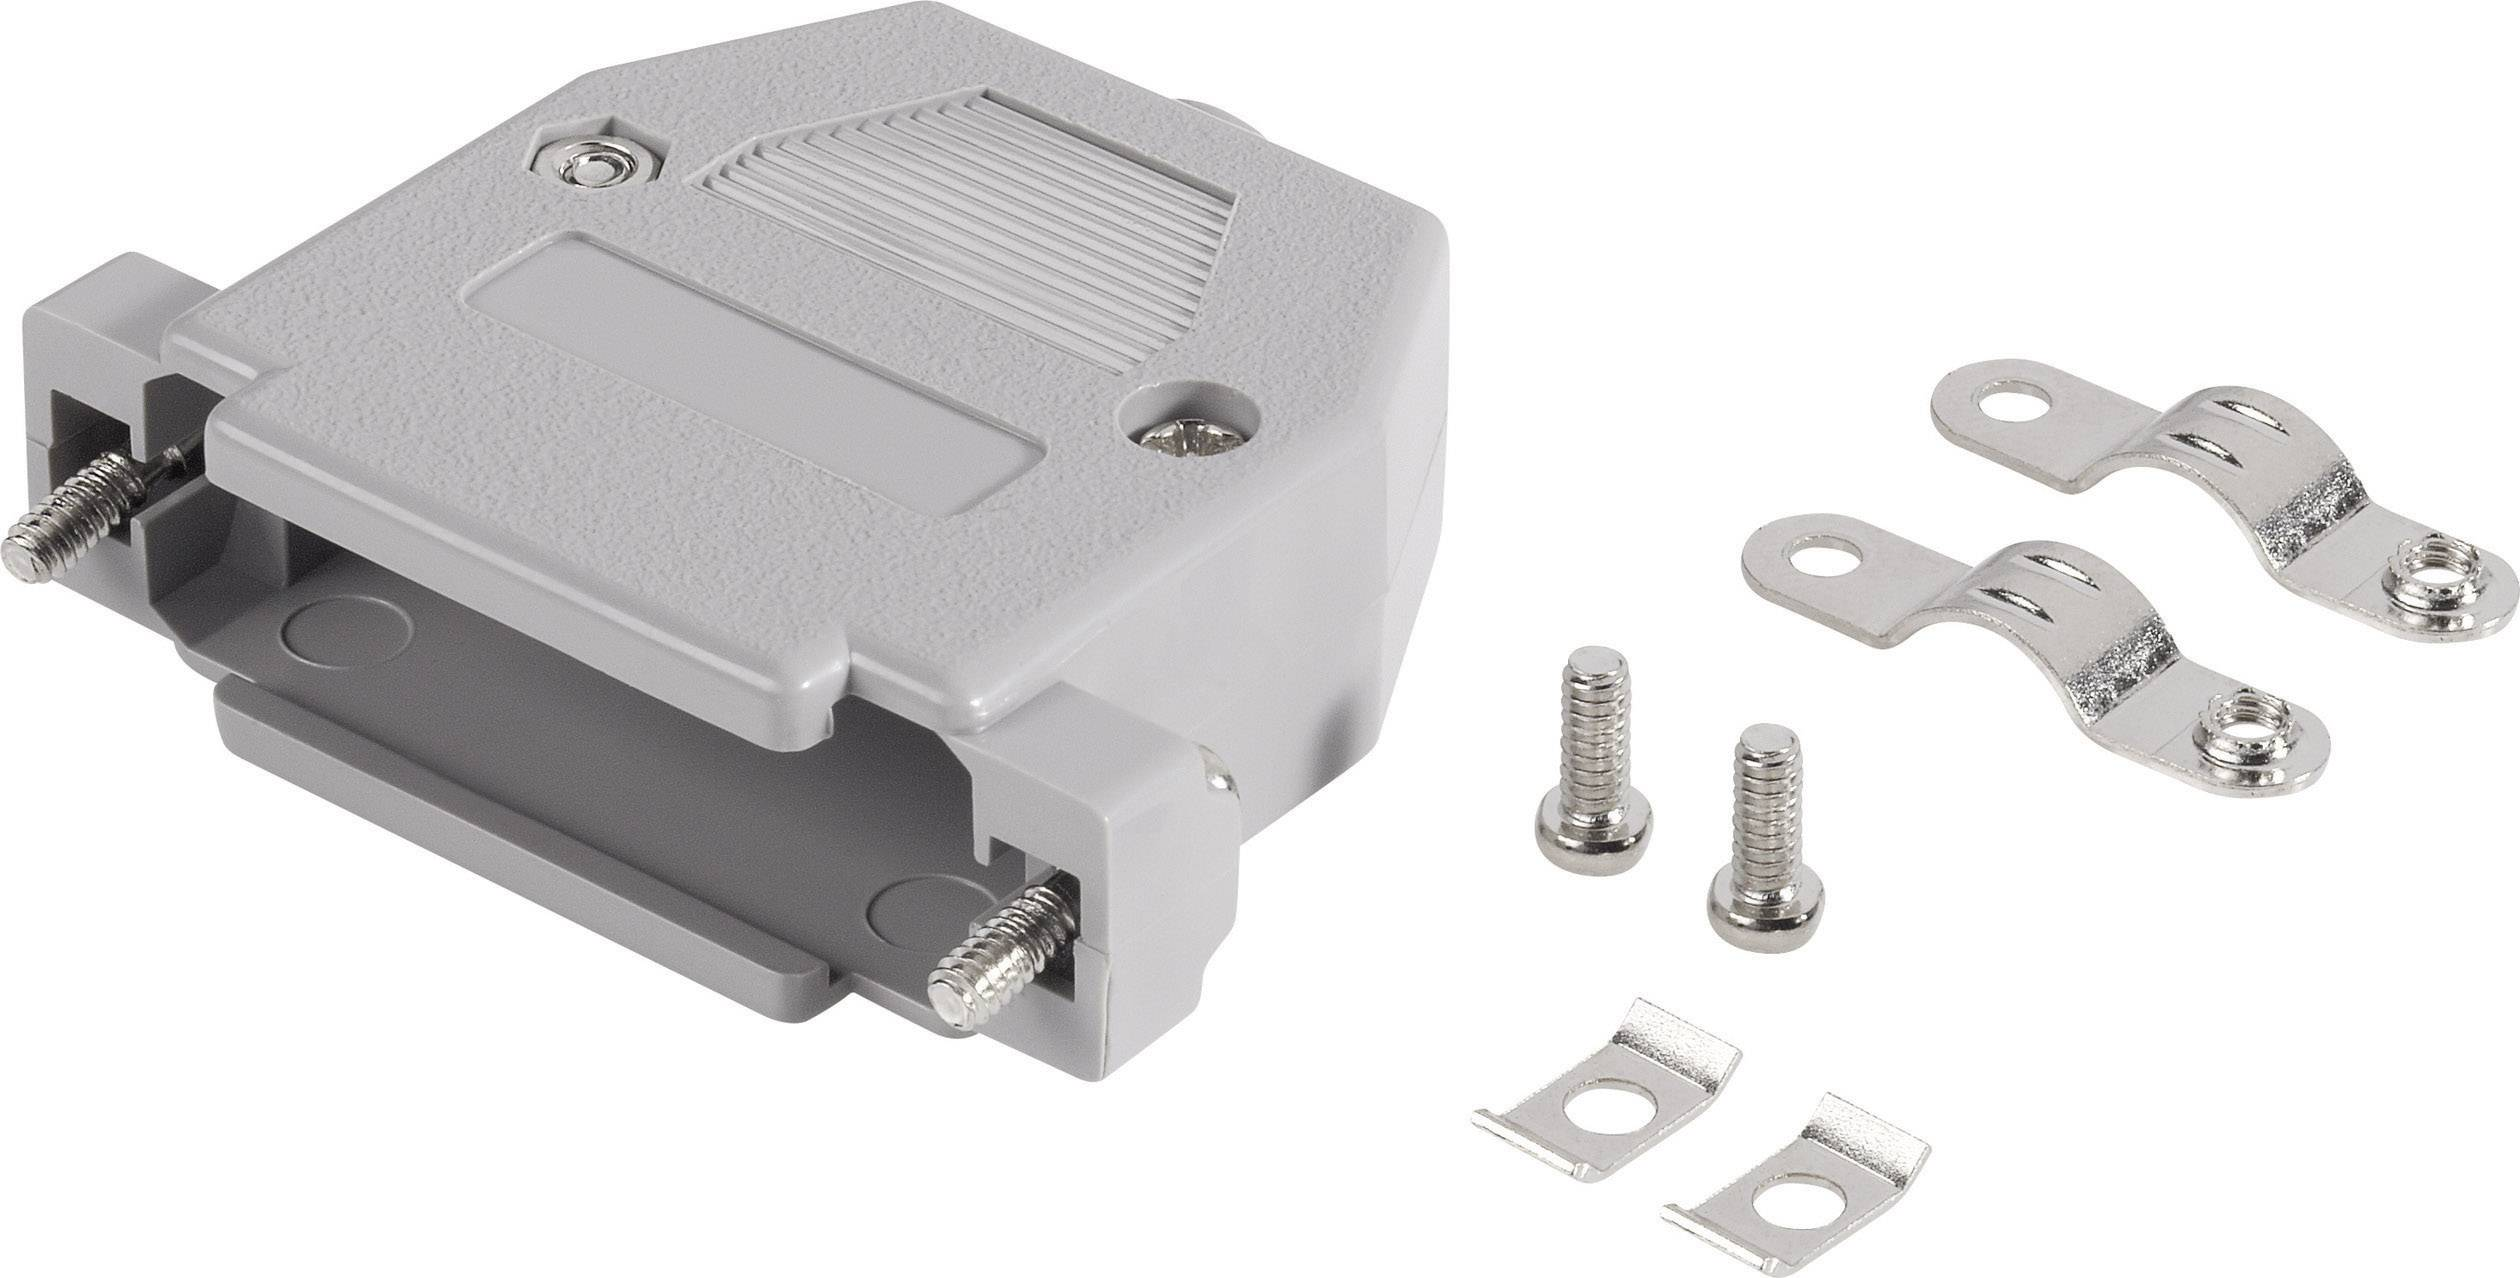 D-SUB púzdro TRU COMPONENTS 1579085, počet pinov: 25, plast, sivá, 1 ks